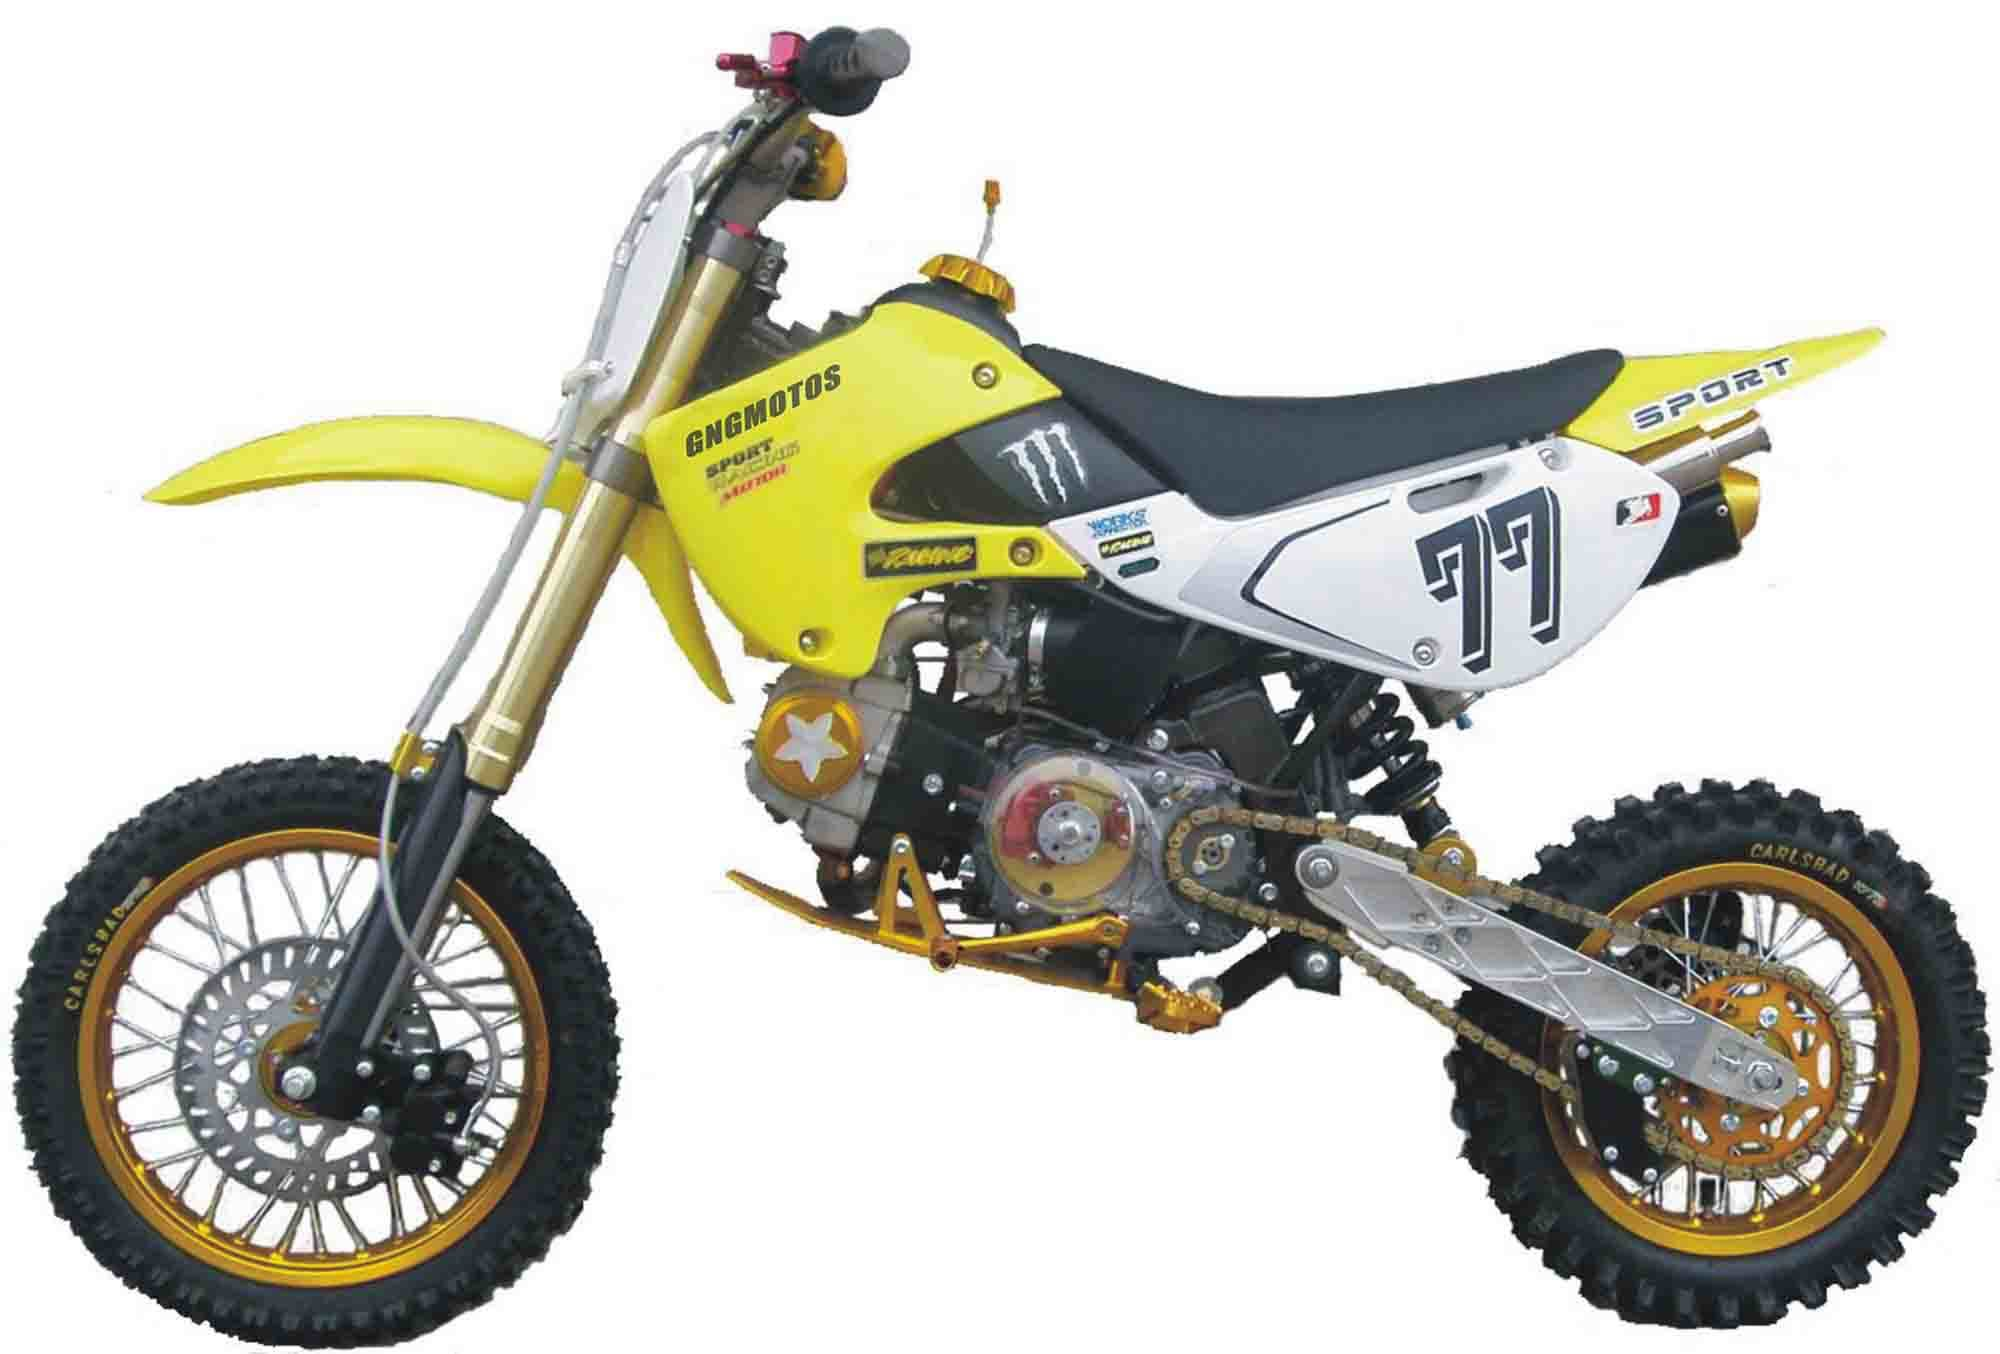 china 140 oil dirt bike gng 140 fashion g china dirt bike dirt bikes. Black Bedroom Furniture Sets. Home Design Ideas